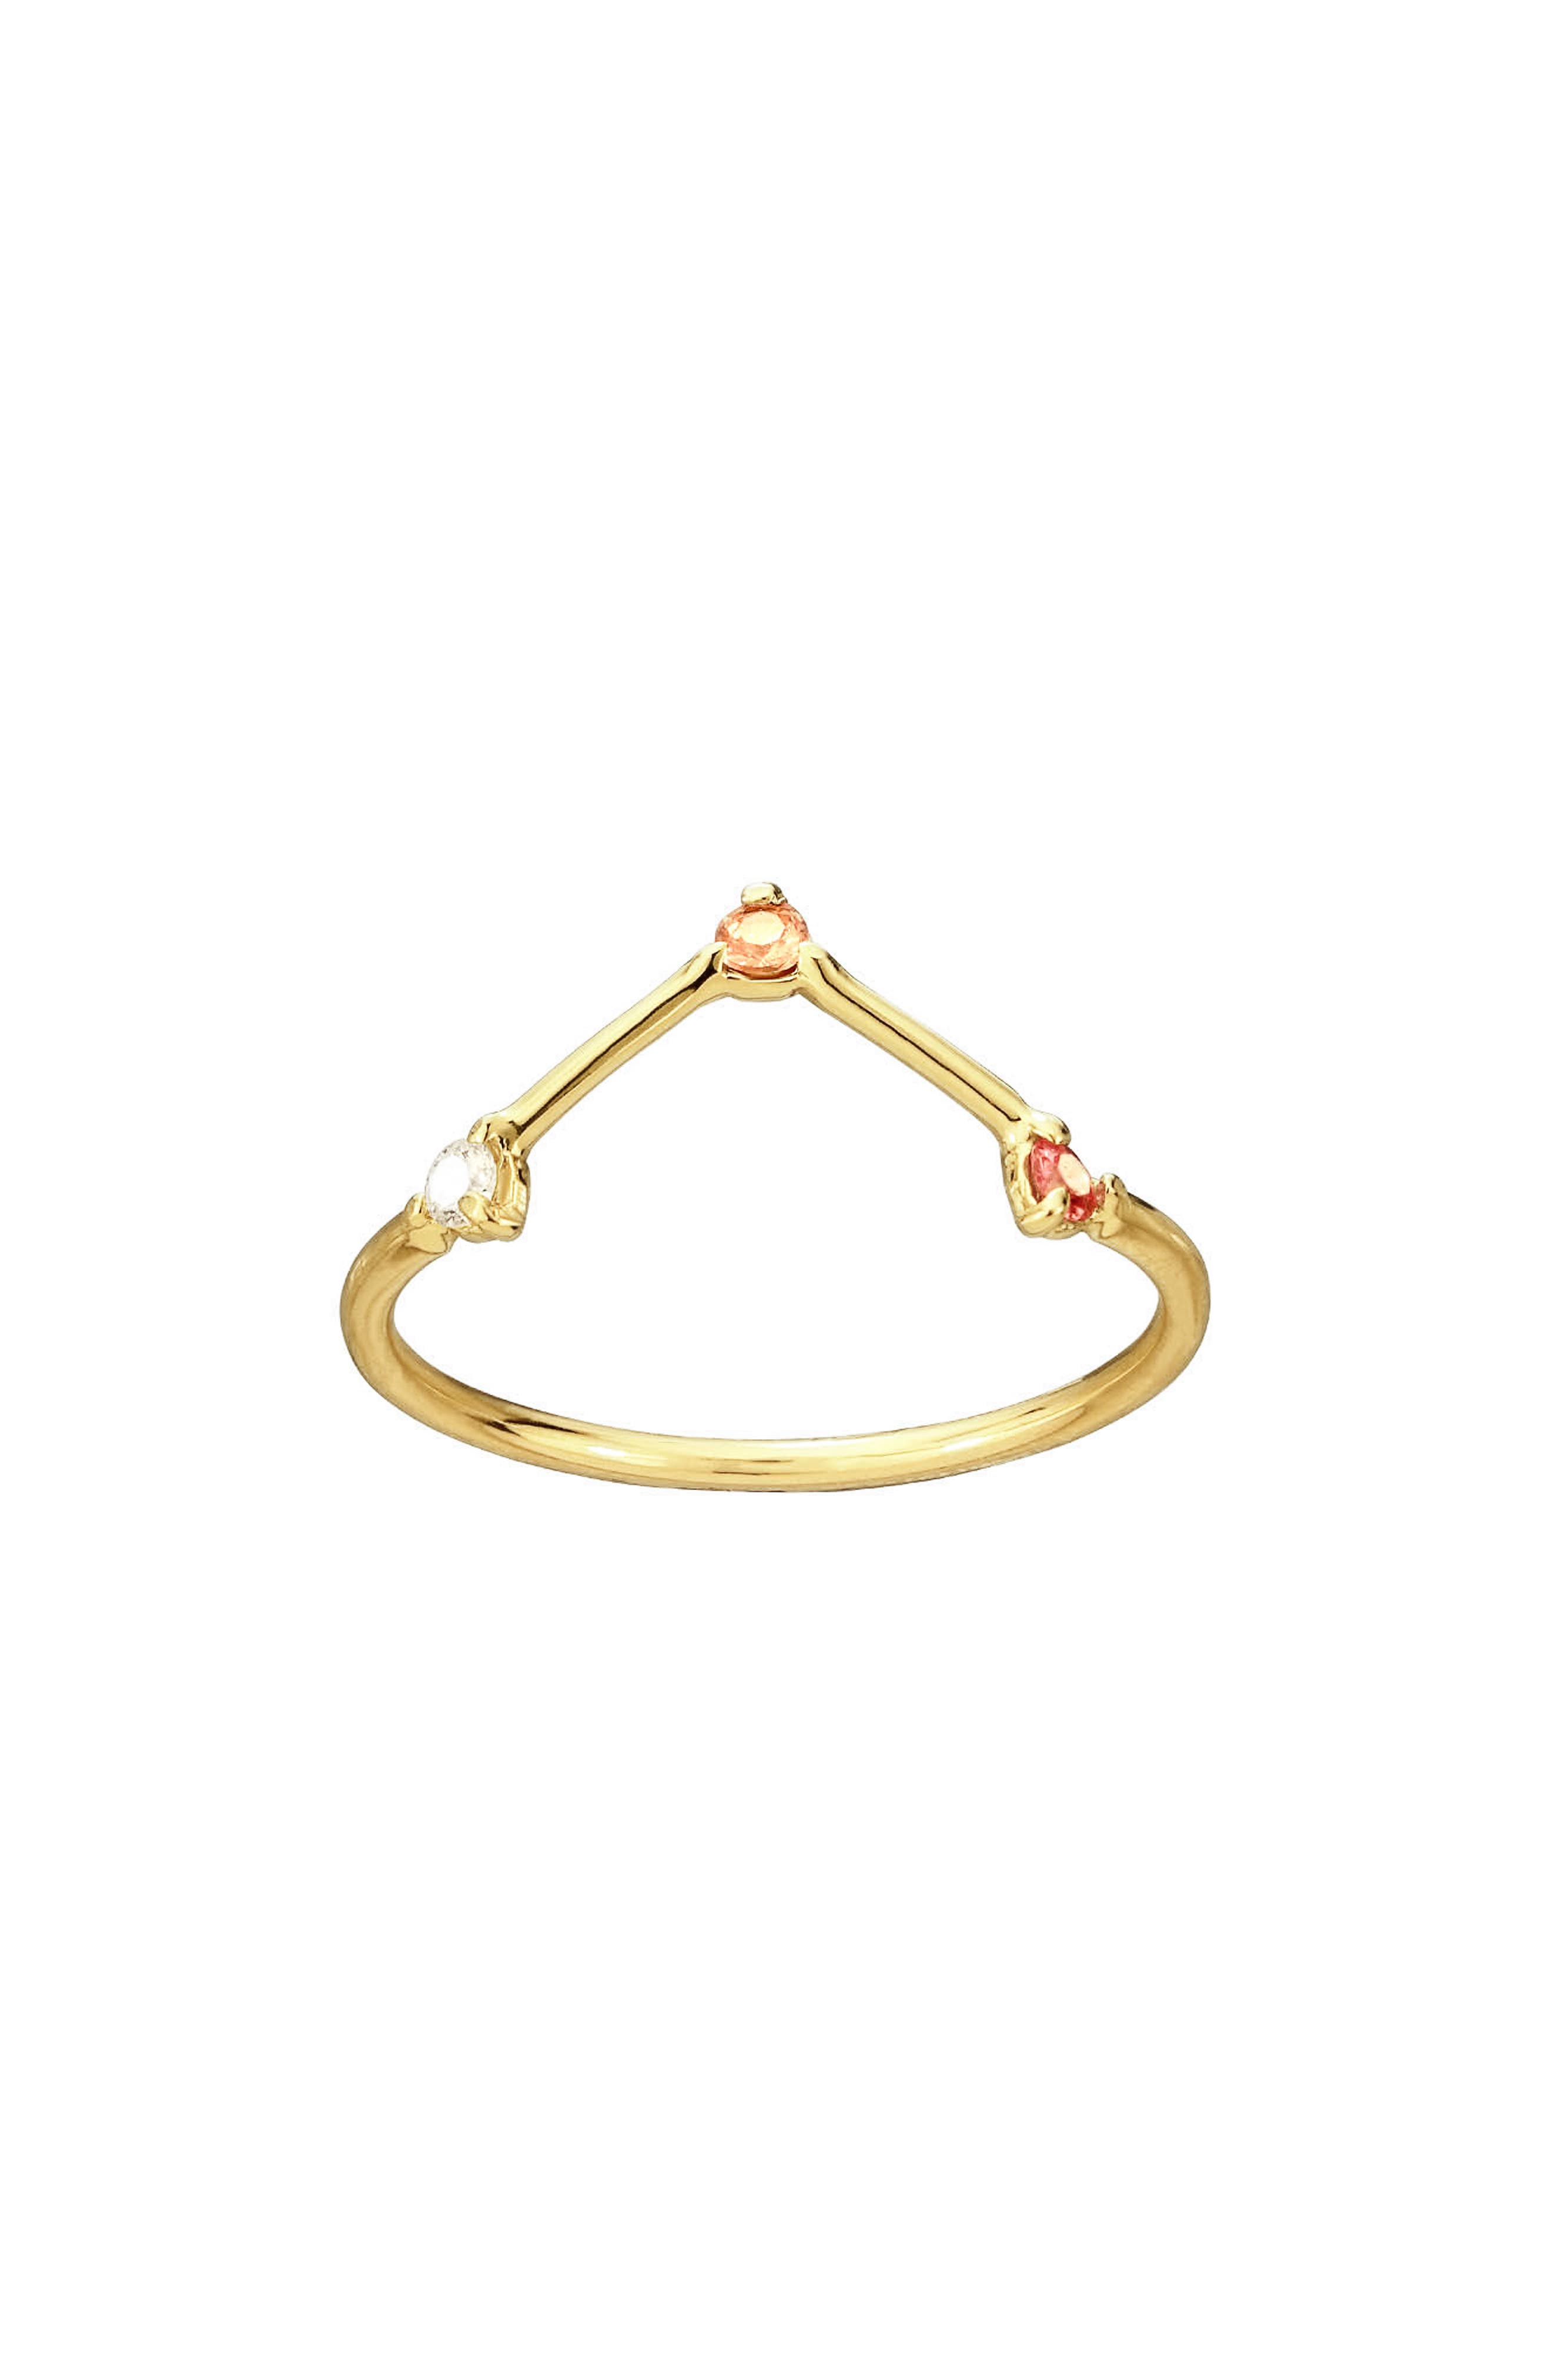 Main Image - WWAKE Counting Collection Three-Step Triangle Sapphire & Diamond Ring